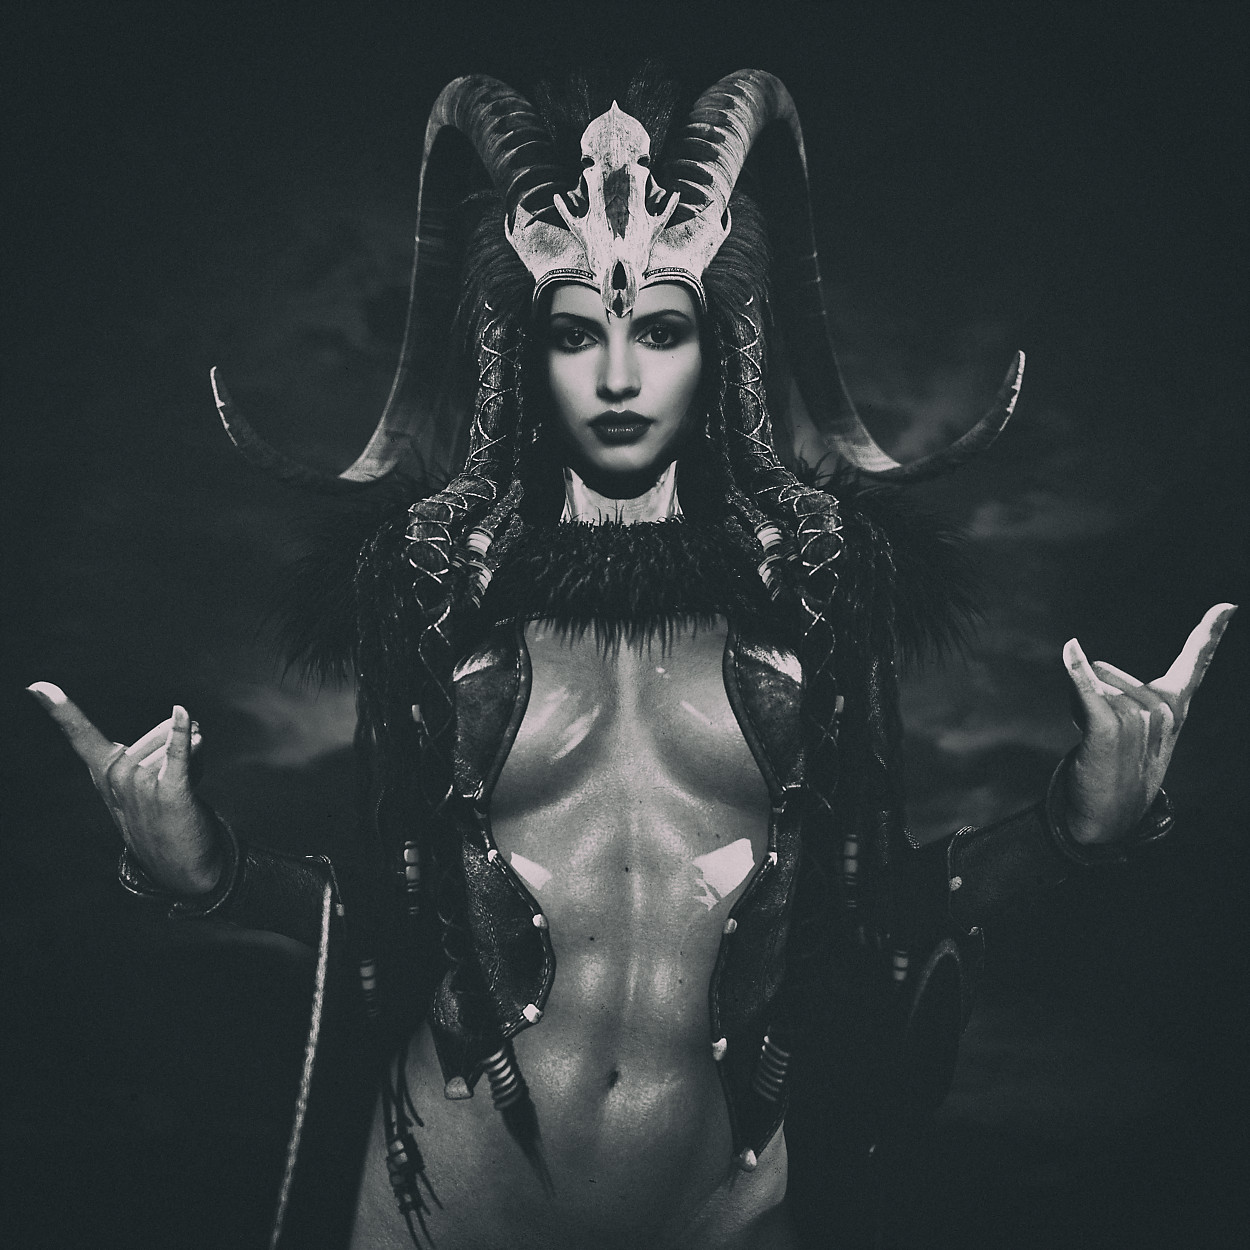 Celtic princess от Огнян Гешев - fressko